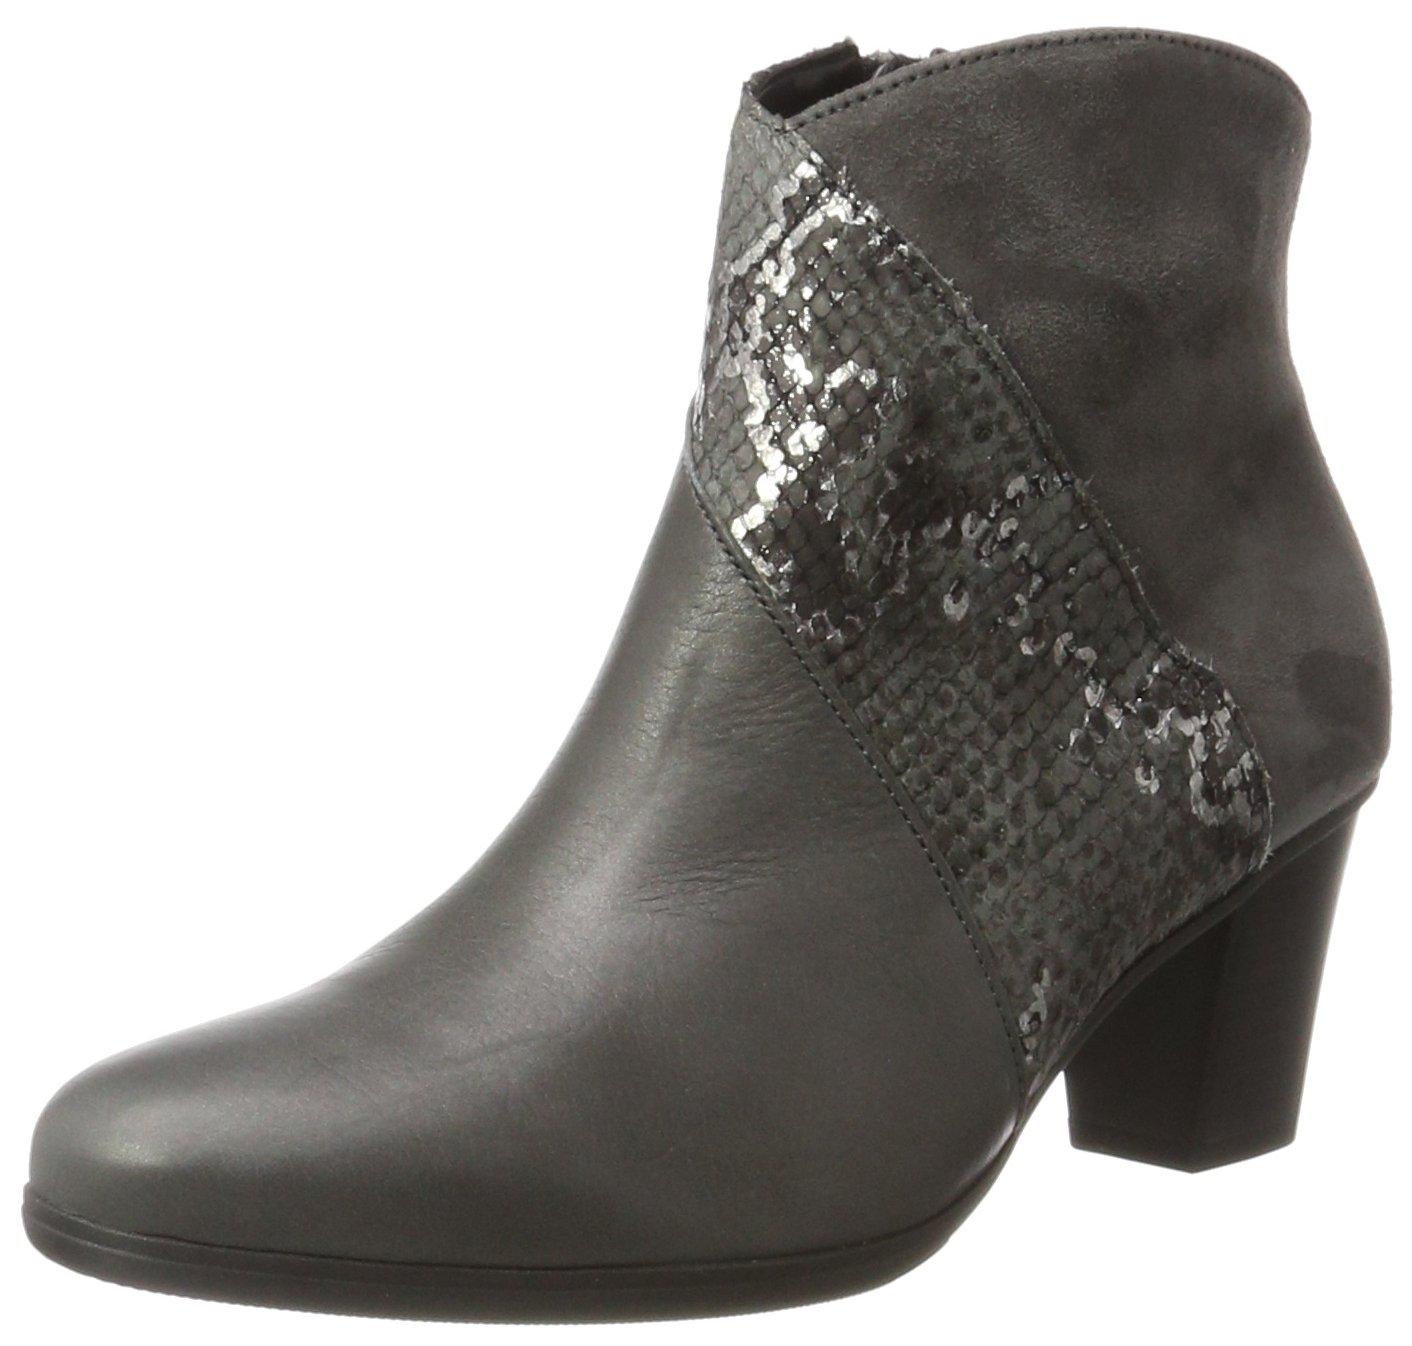 Gabor Shoes Gabor Basic, Bottes Femme 17783 Gris (69 Bottes Gabor Dark-grey Micro) 3d570b5 - boatplans.space